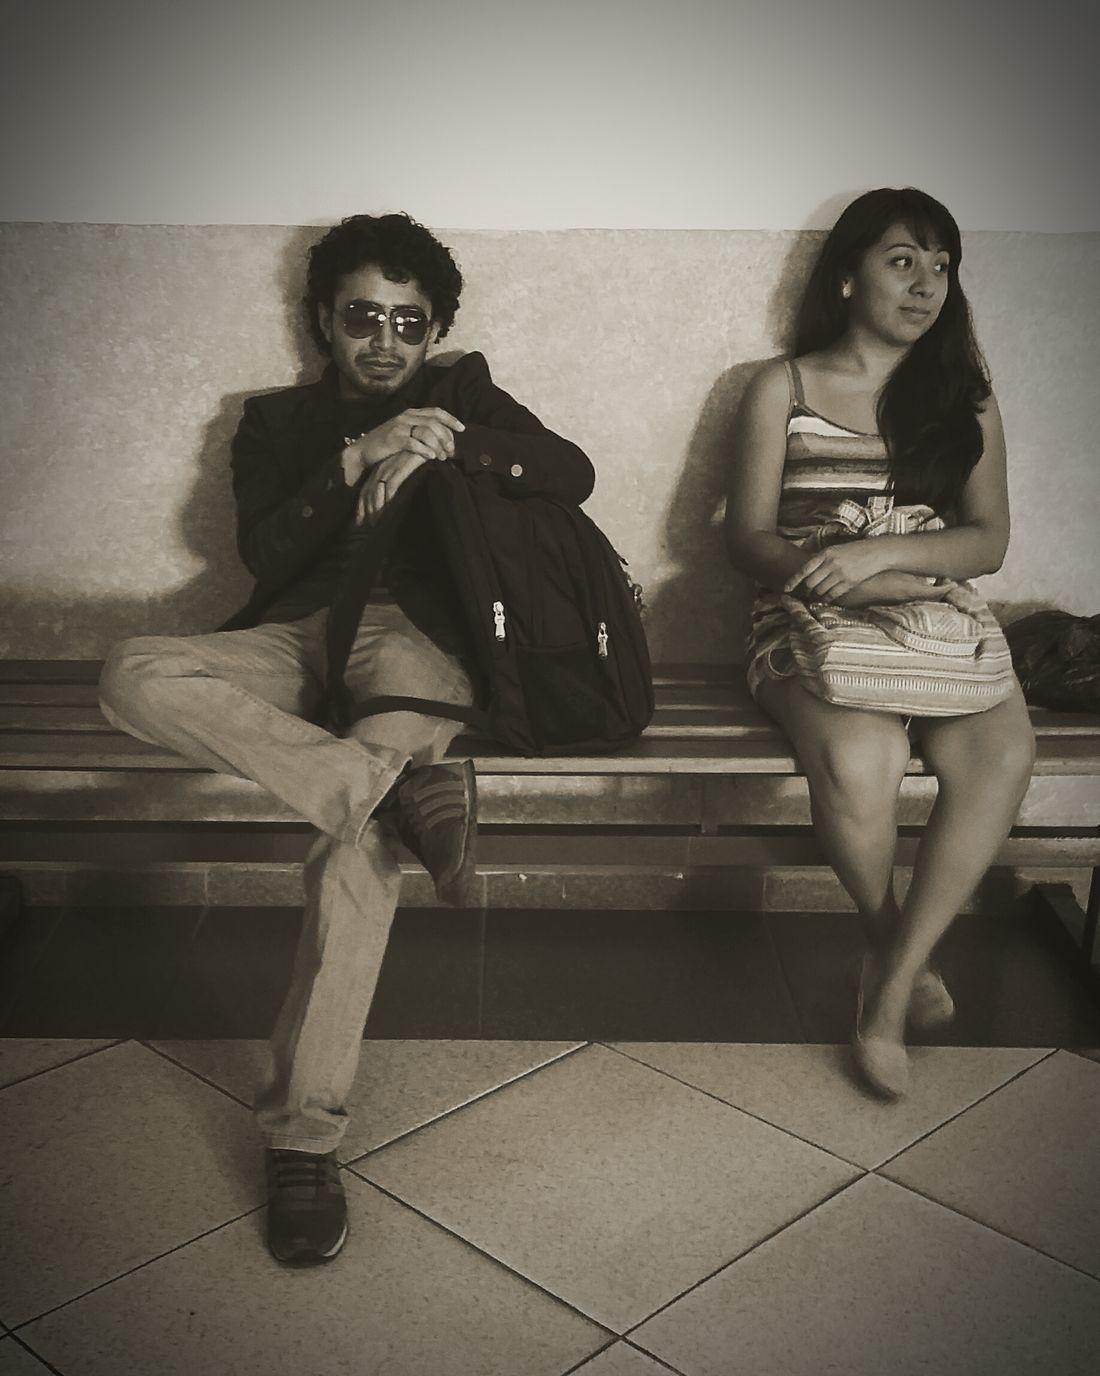 En la espera del tren!? Jajajajaja😆🙋🙌 Class